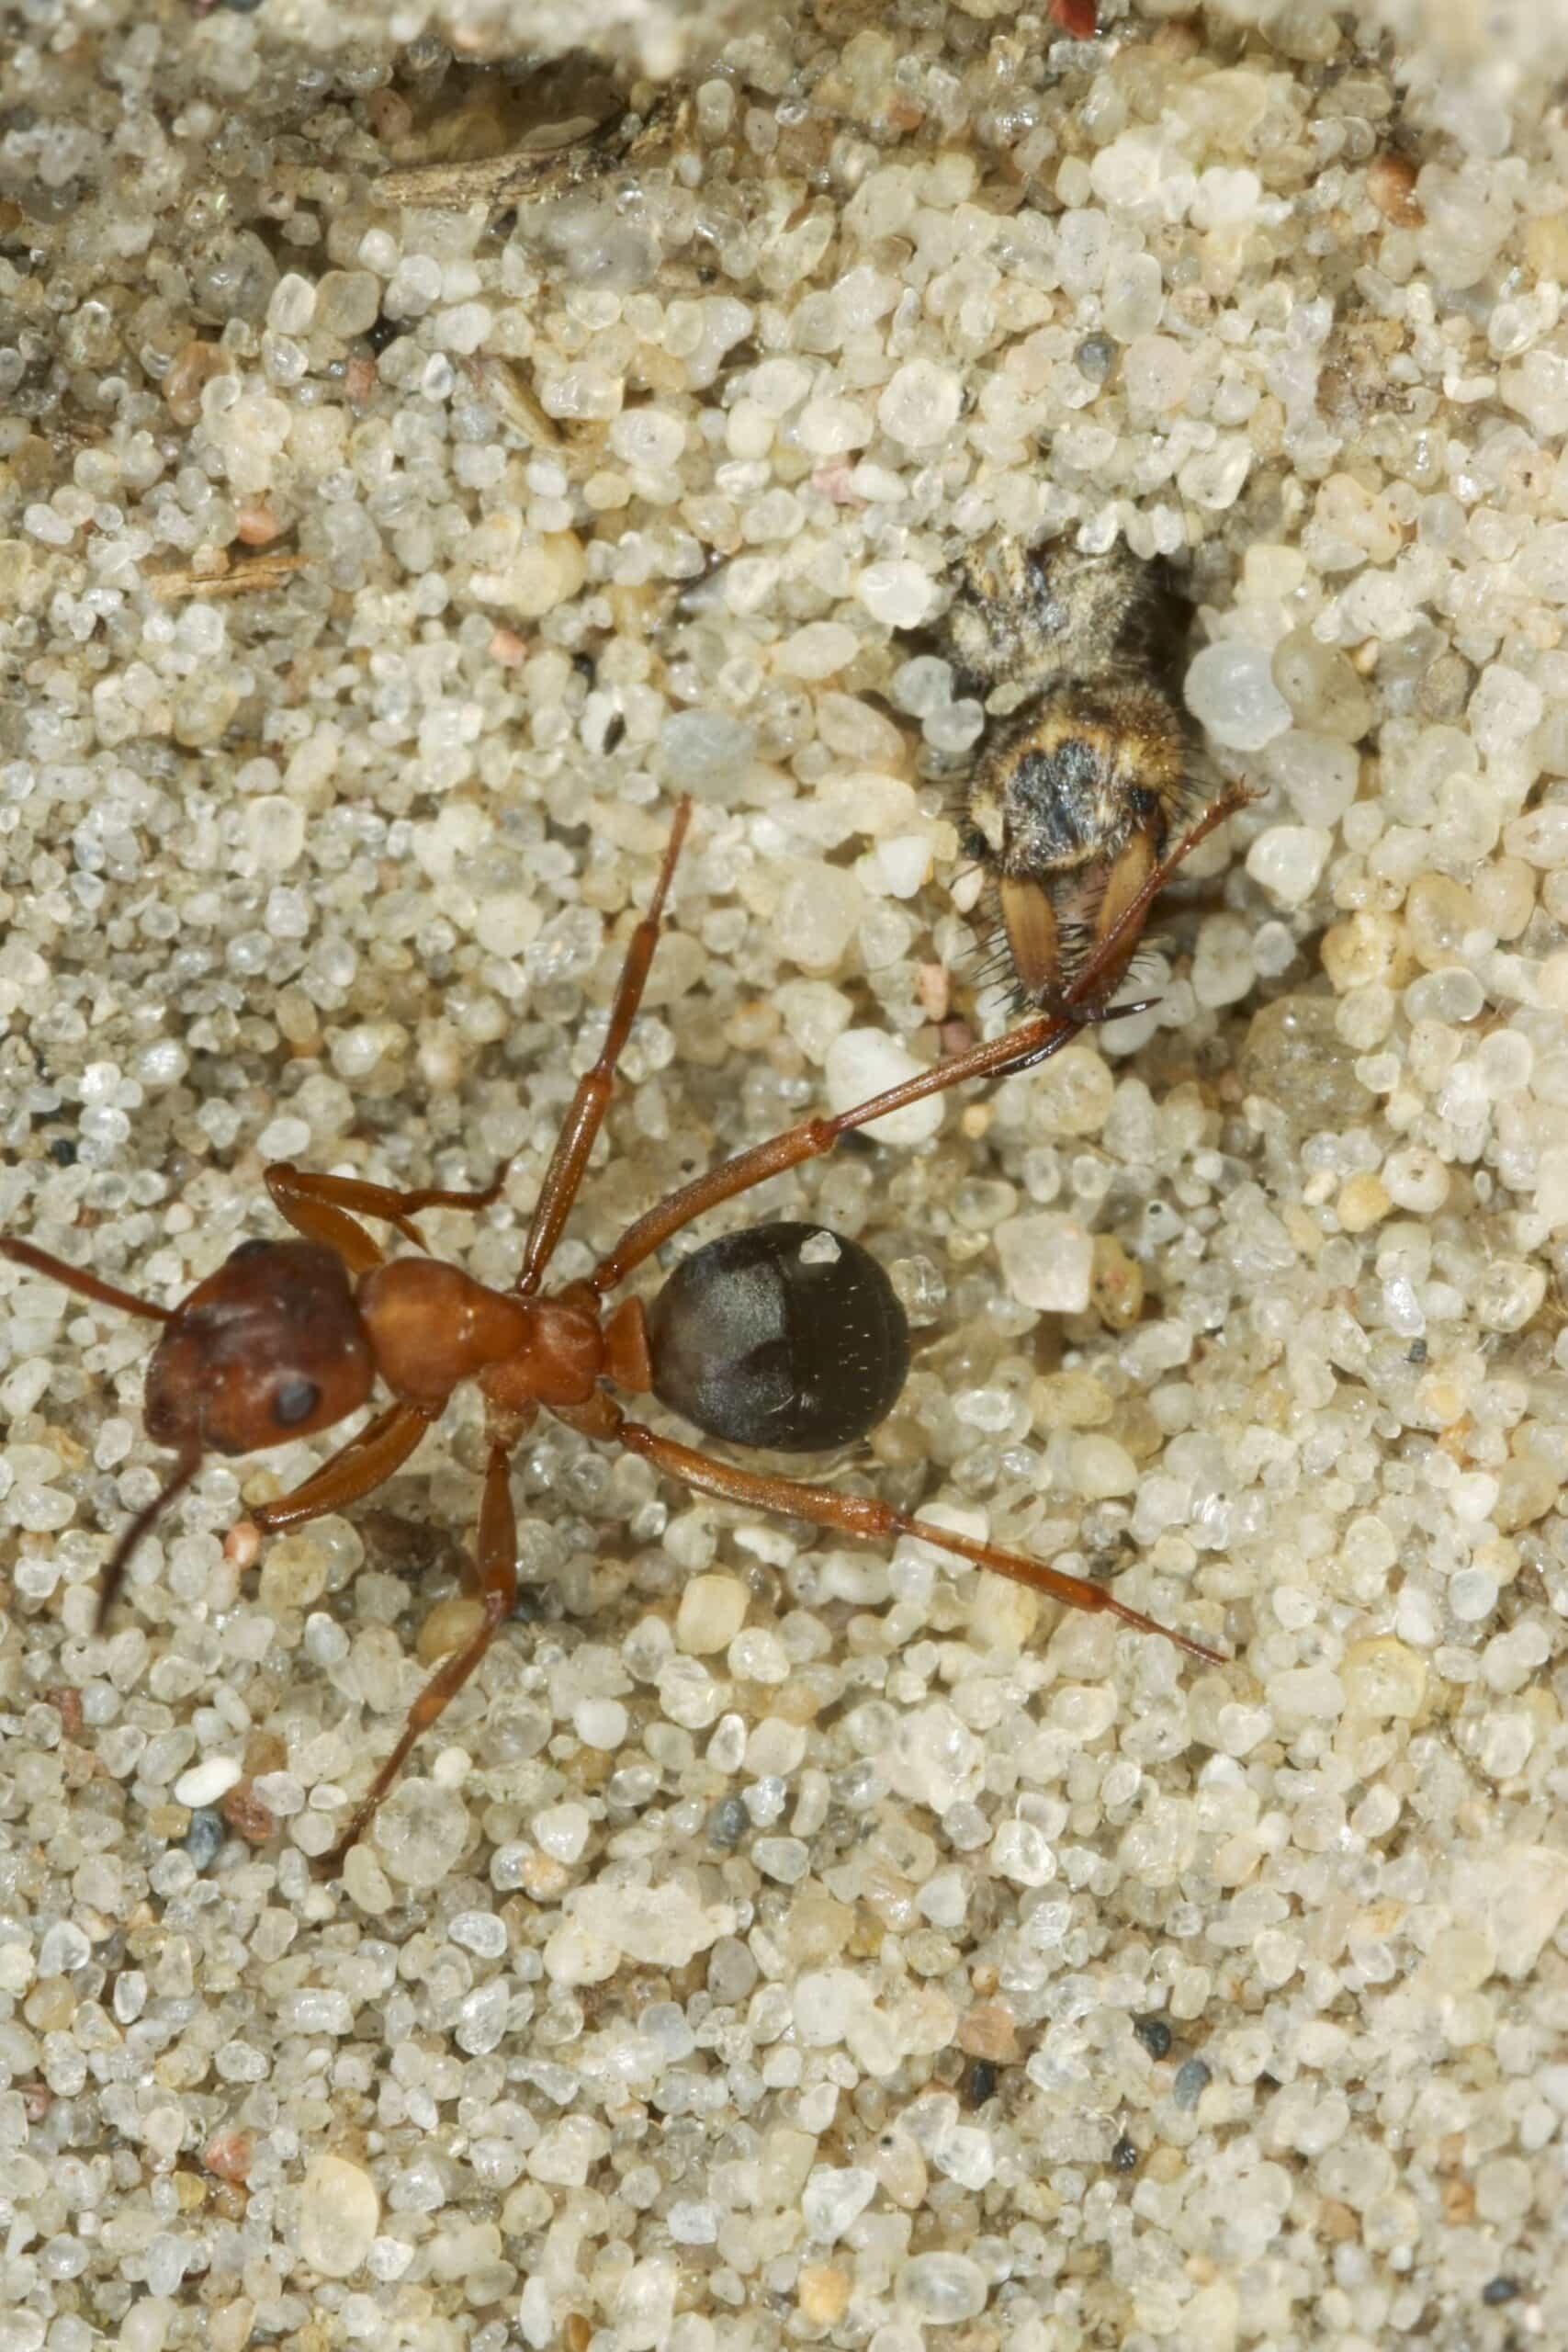 Ameisenjungfer 16